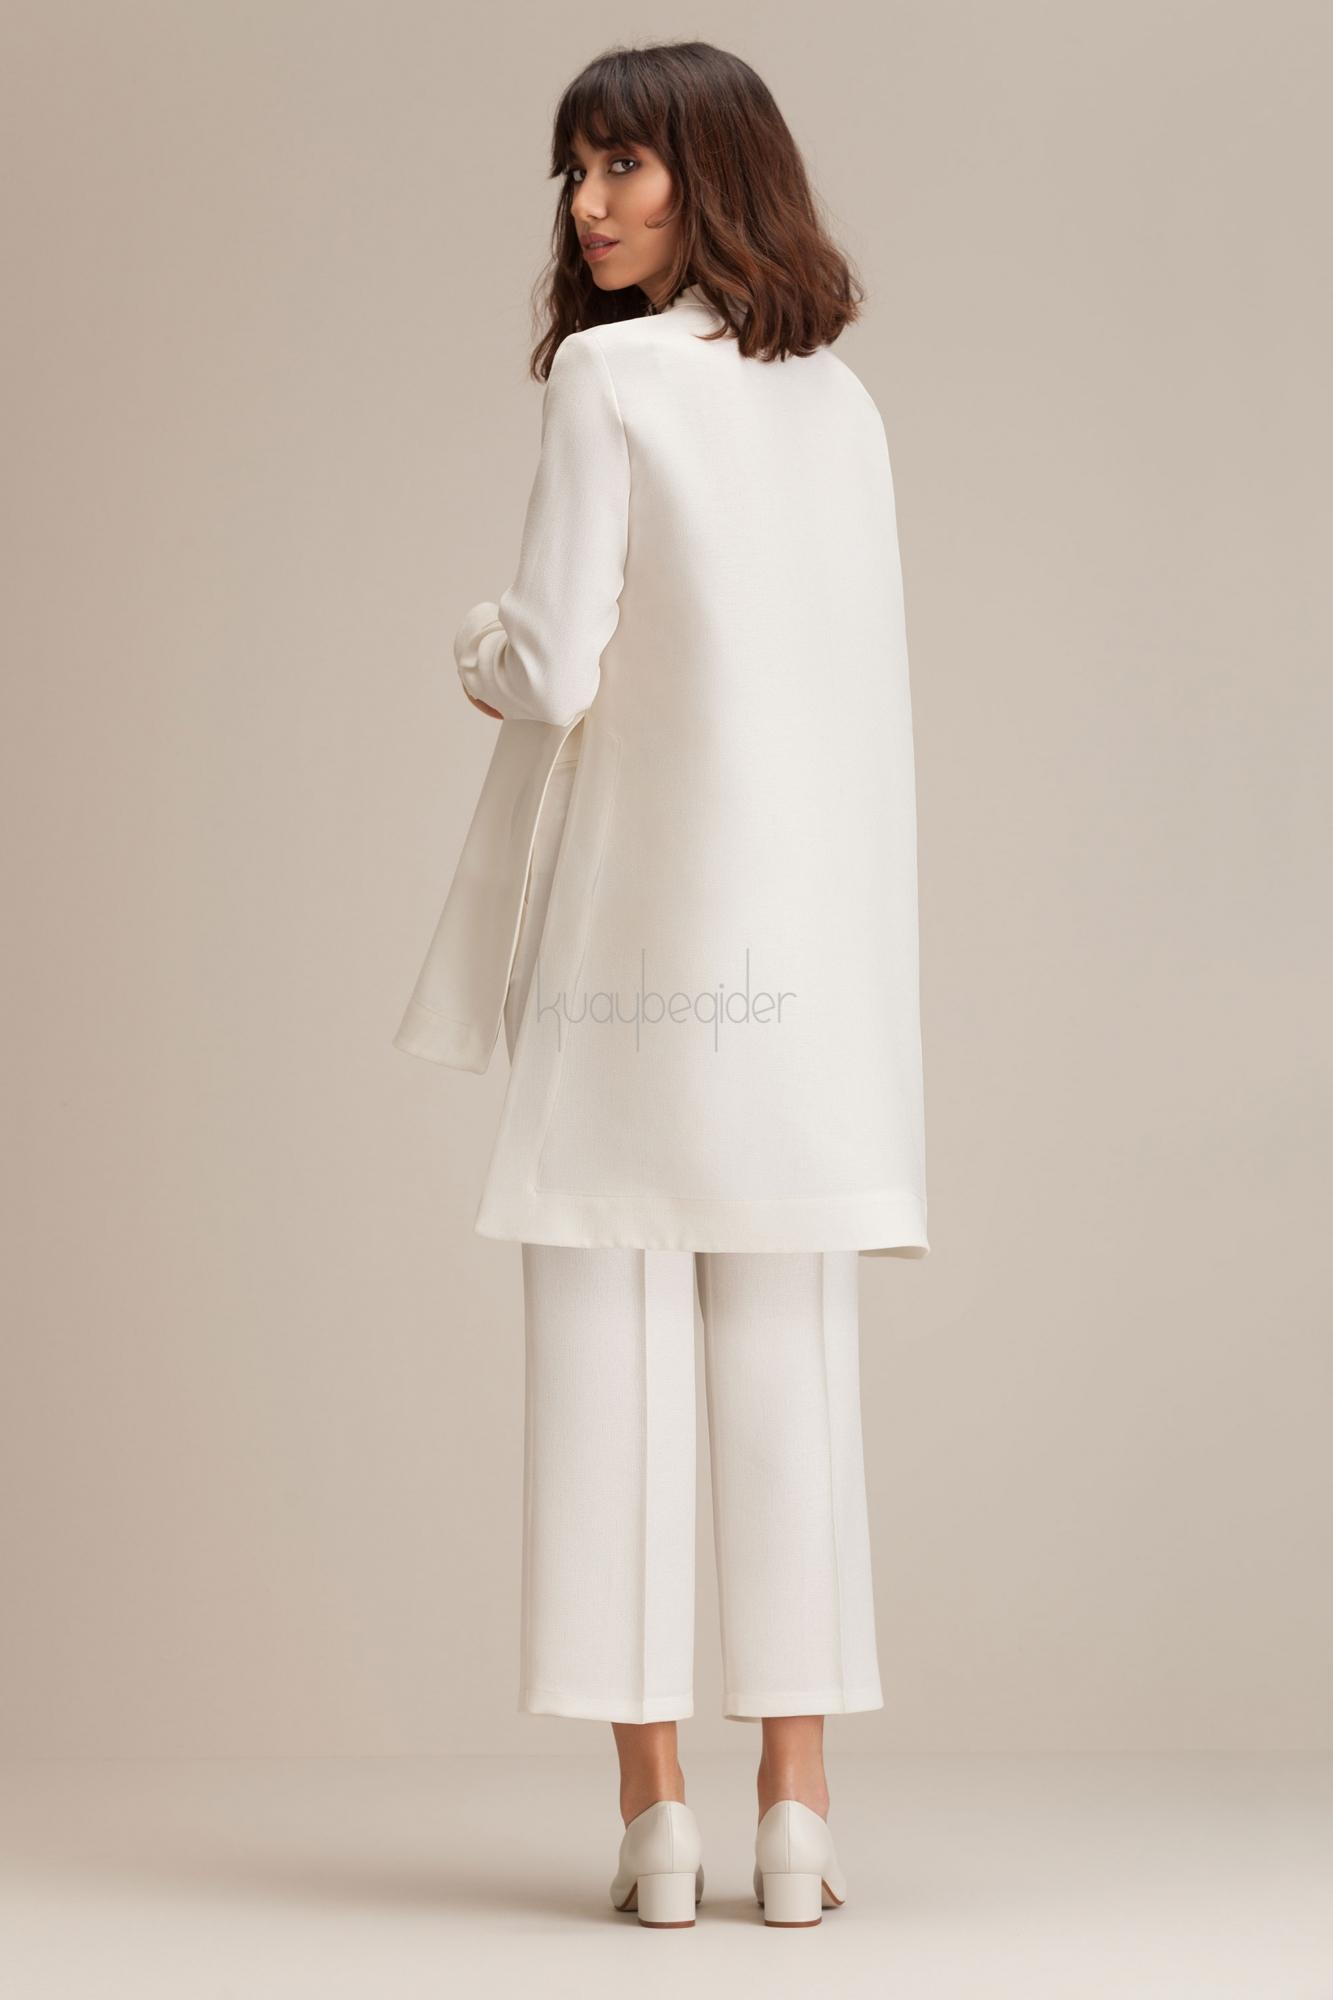 Kuaybe Gider - Ekru Miroir Pantolon